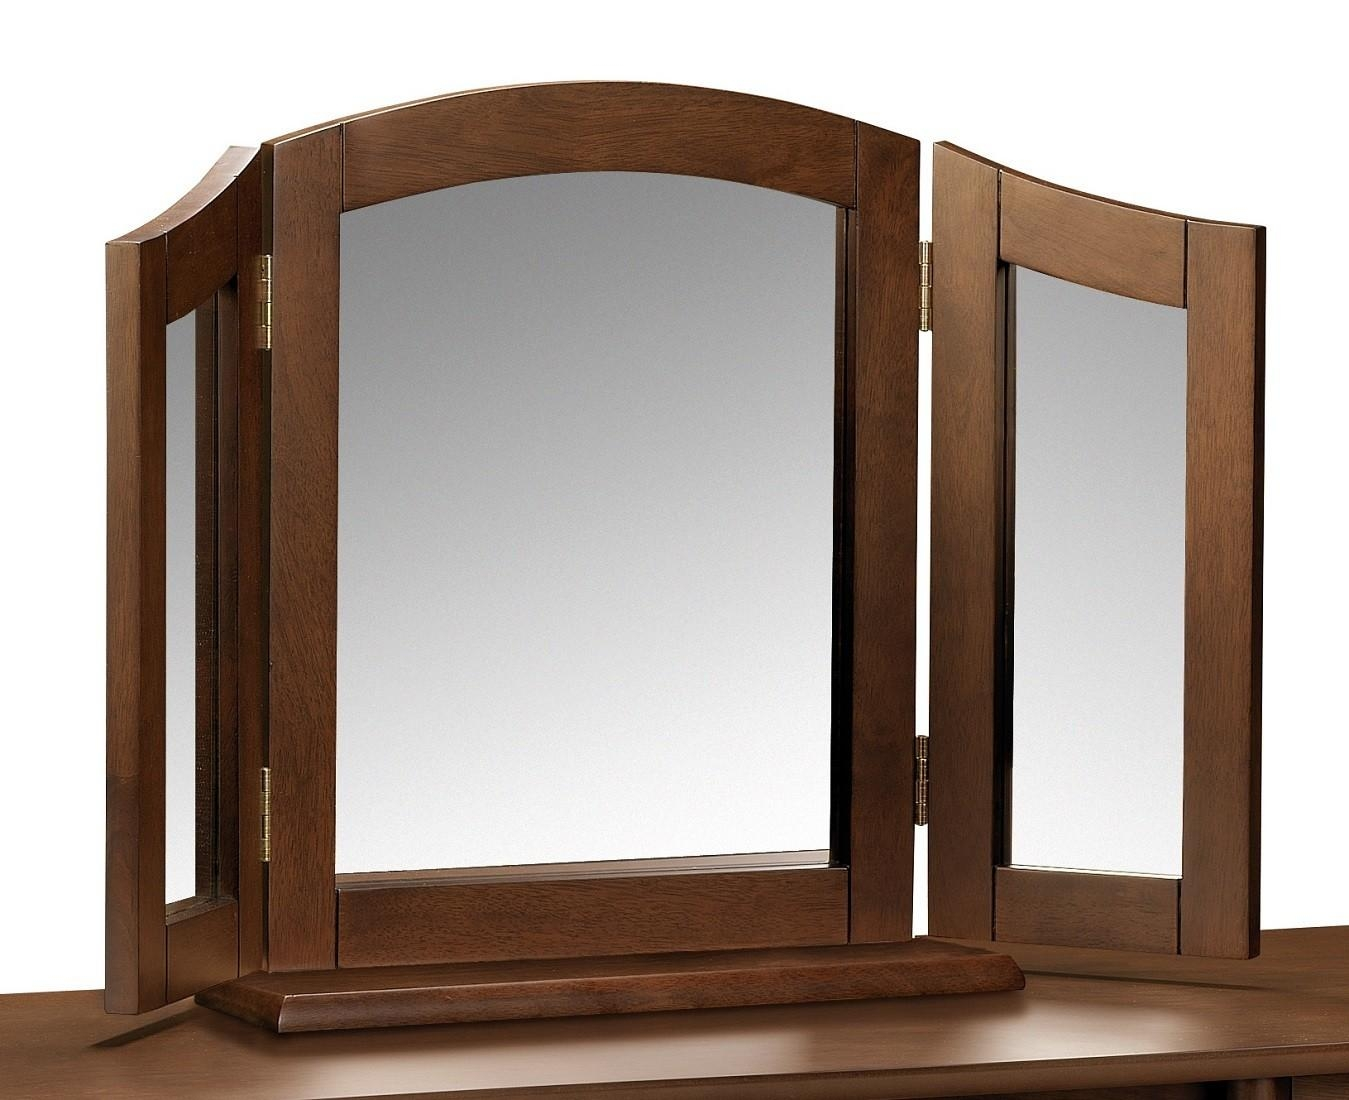 Westminster Triple Dressing Table Mirror | Oak Furniture Uk With Regard To Dressing Table Mirrors (Image 18 of 20)